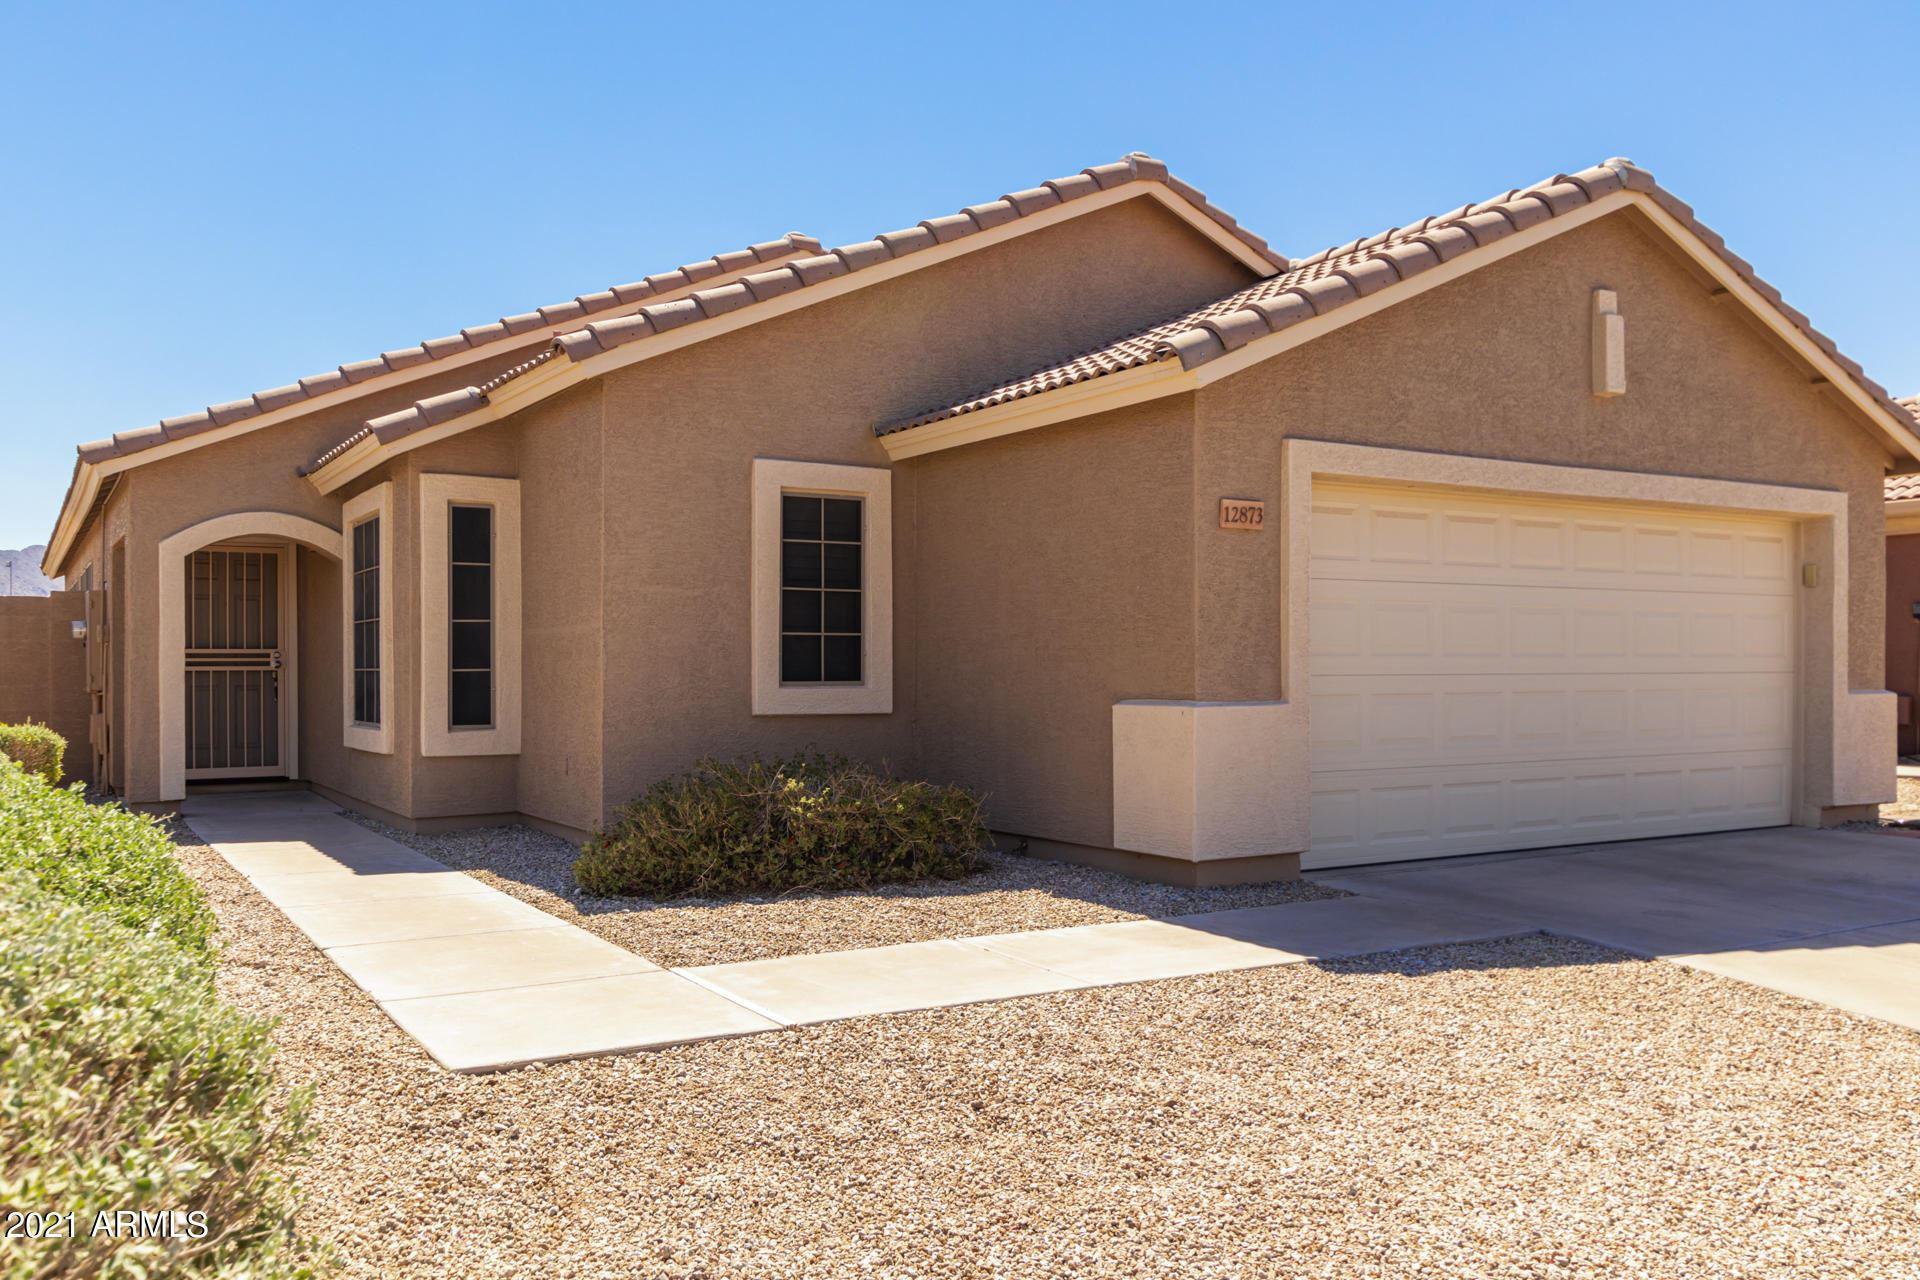 Photo of 12873 S 175TH Avenue, Goodyear, AZ 85338 (MLS # 6249977)